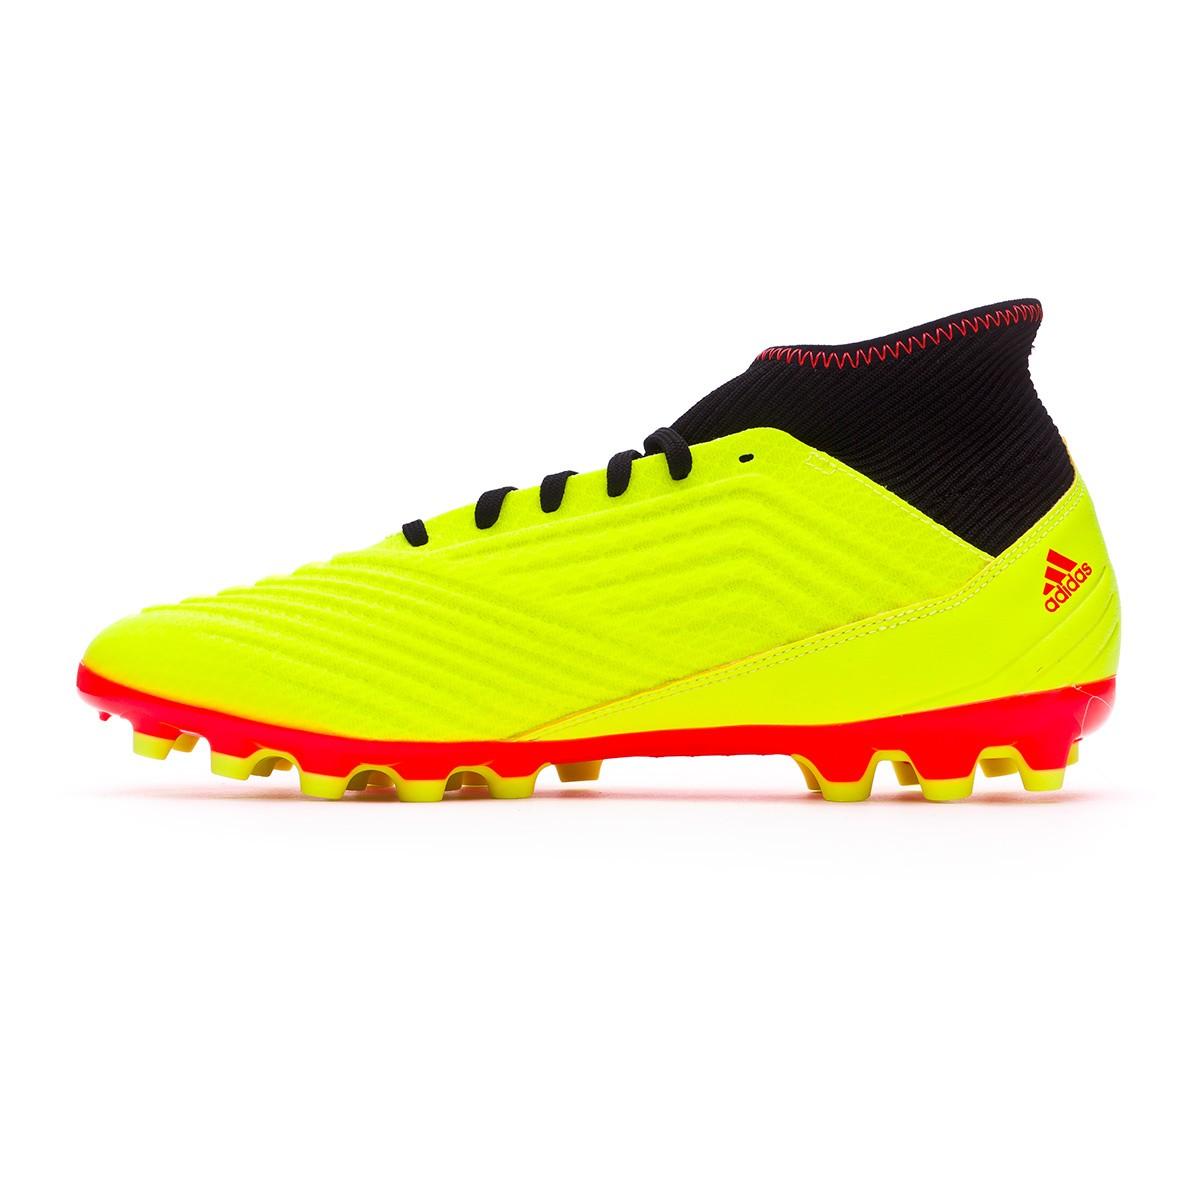 d794677fbdb Football Boots adidas Predator 18.3 AG Solar yellow-Black-Solar red -  Tienda de fútbol Fútbol Emotion